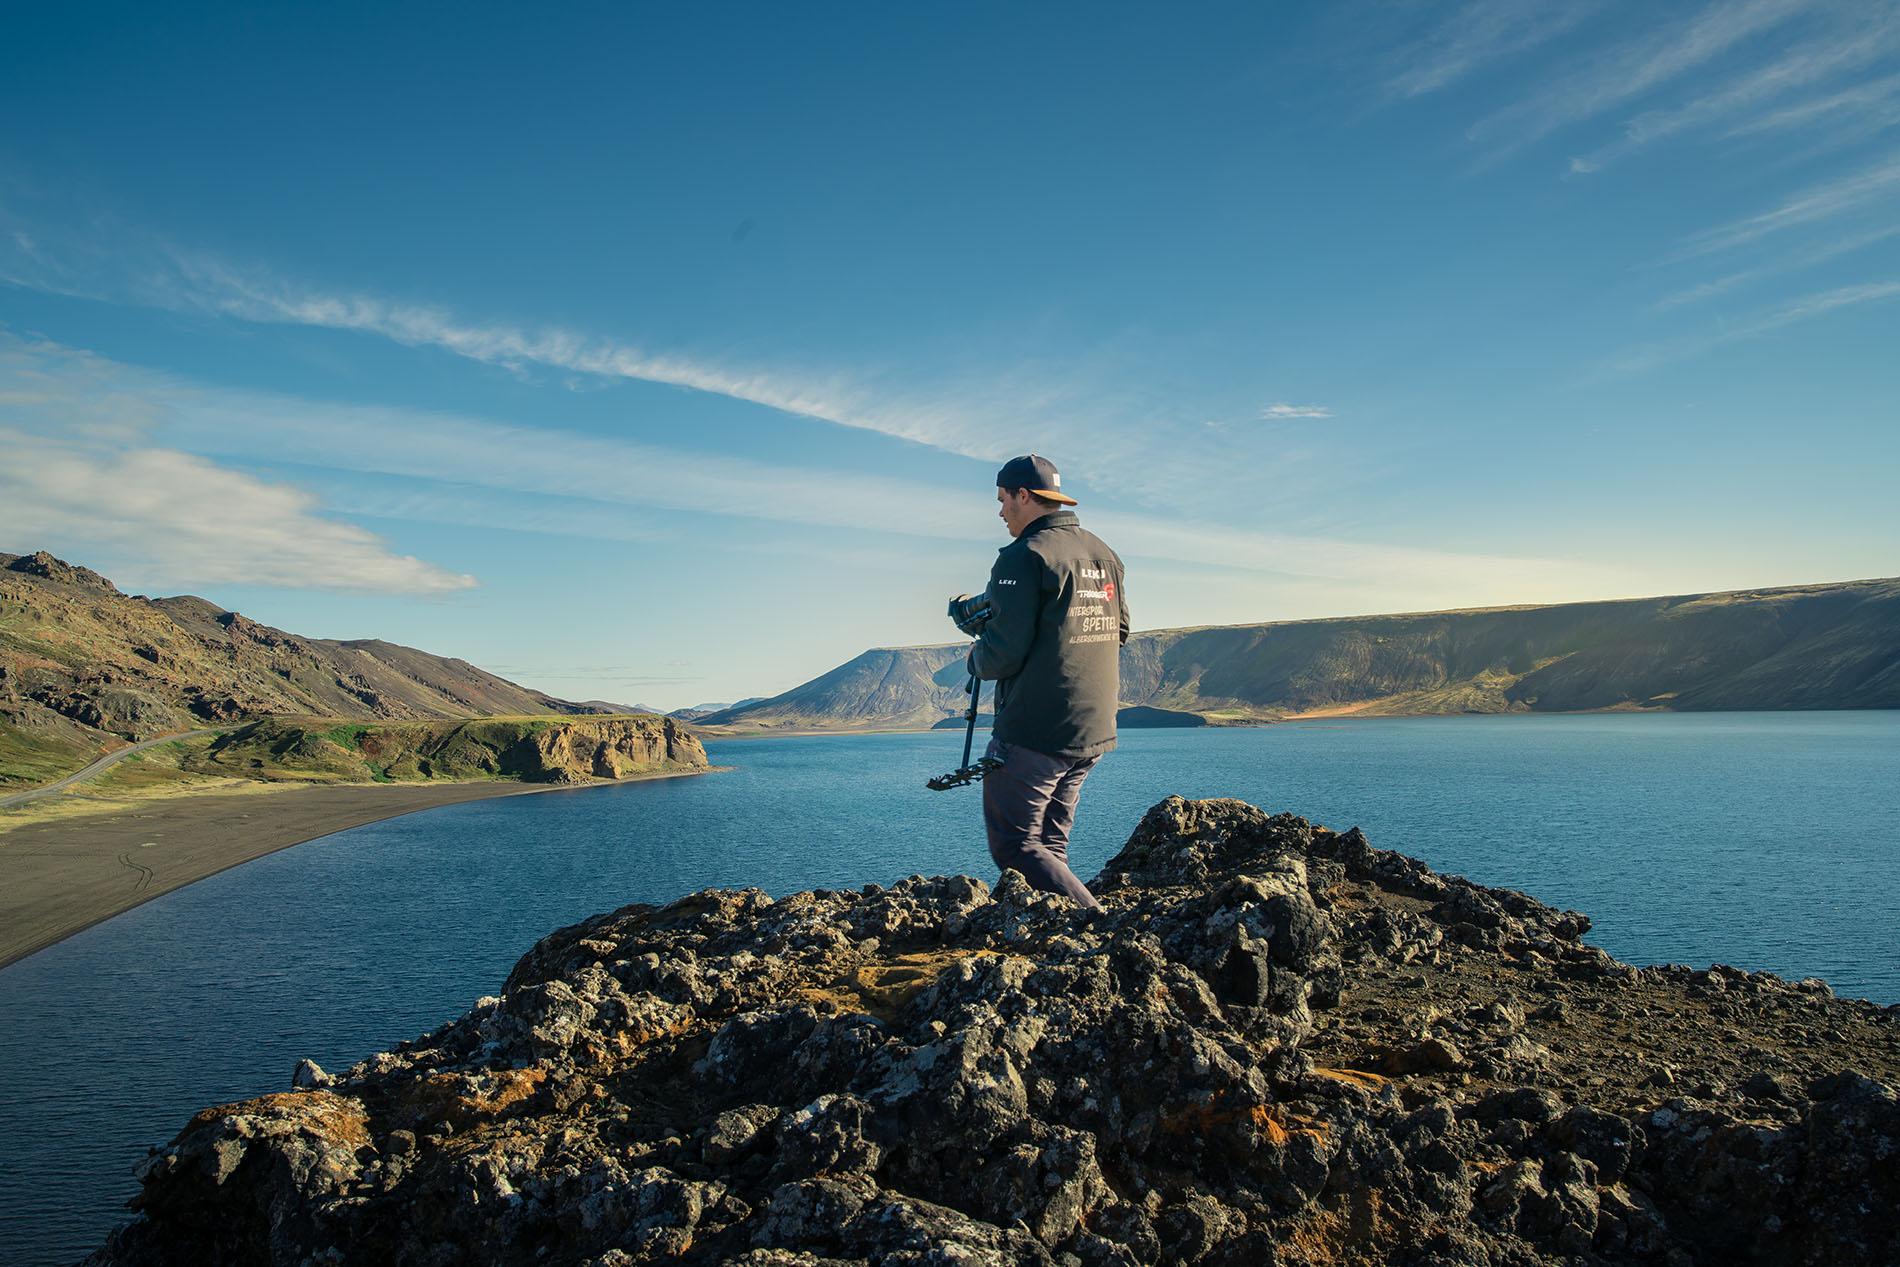 David Spettel, Keflavik, Iceland, videography, davision pictures